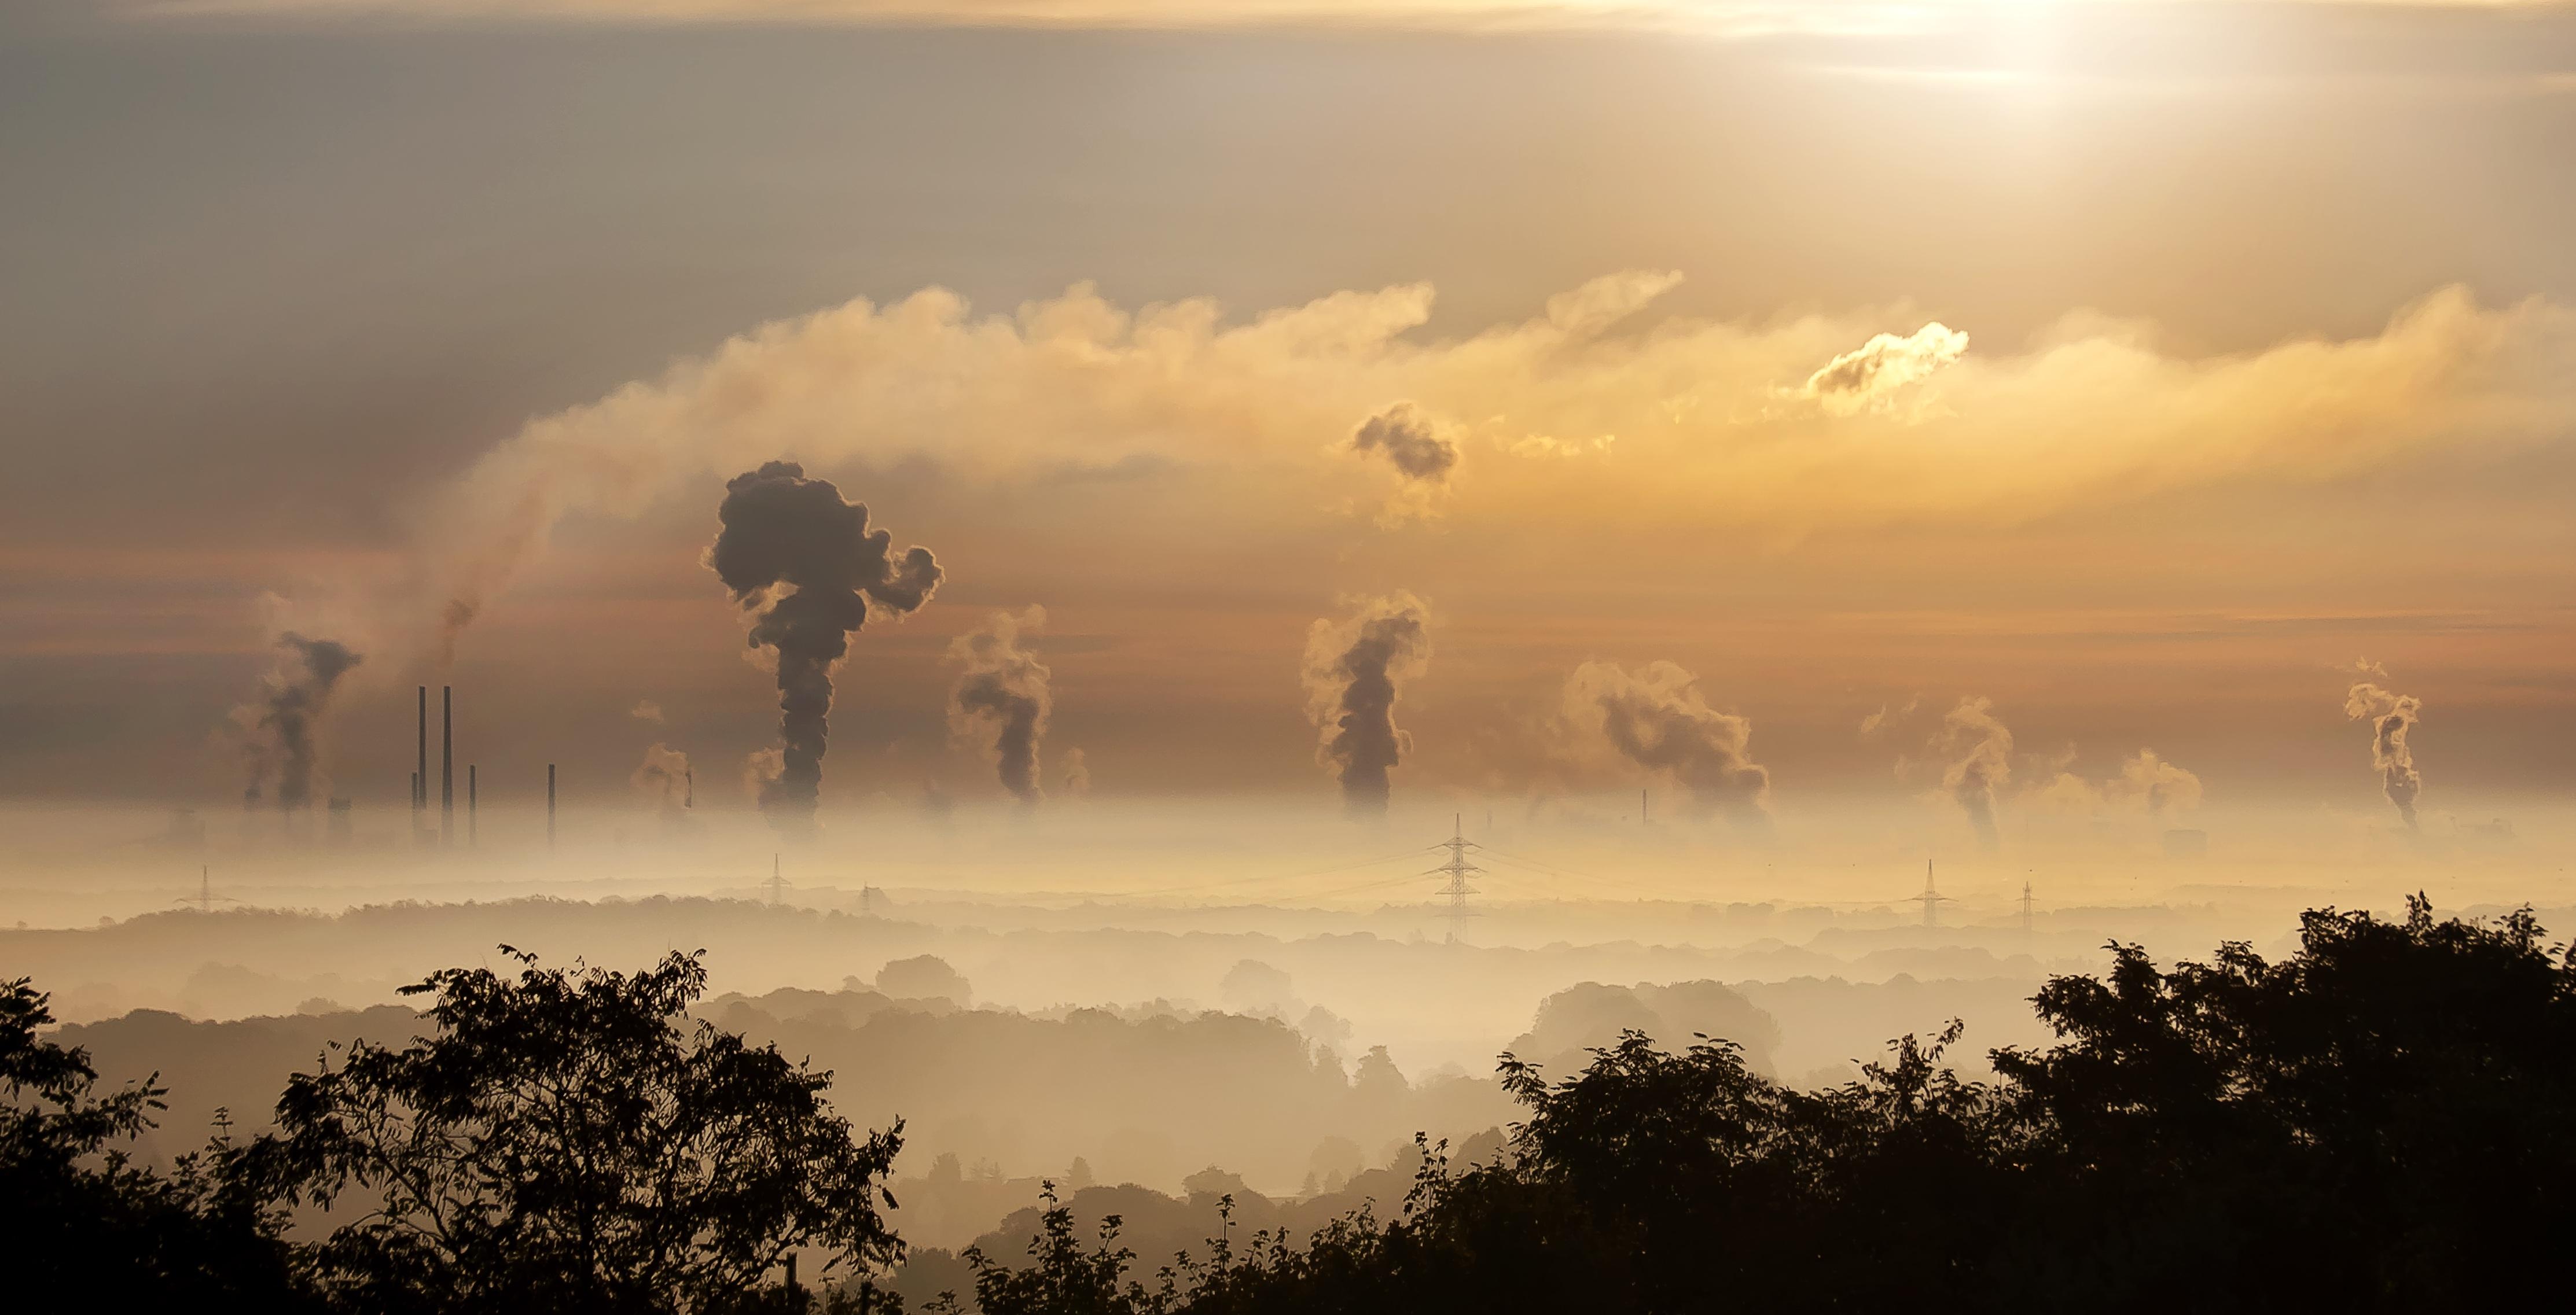 industry-sunrise-clouds-fog-39553.jpeg